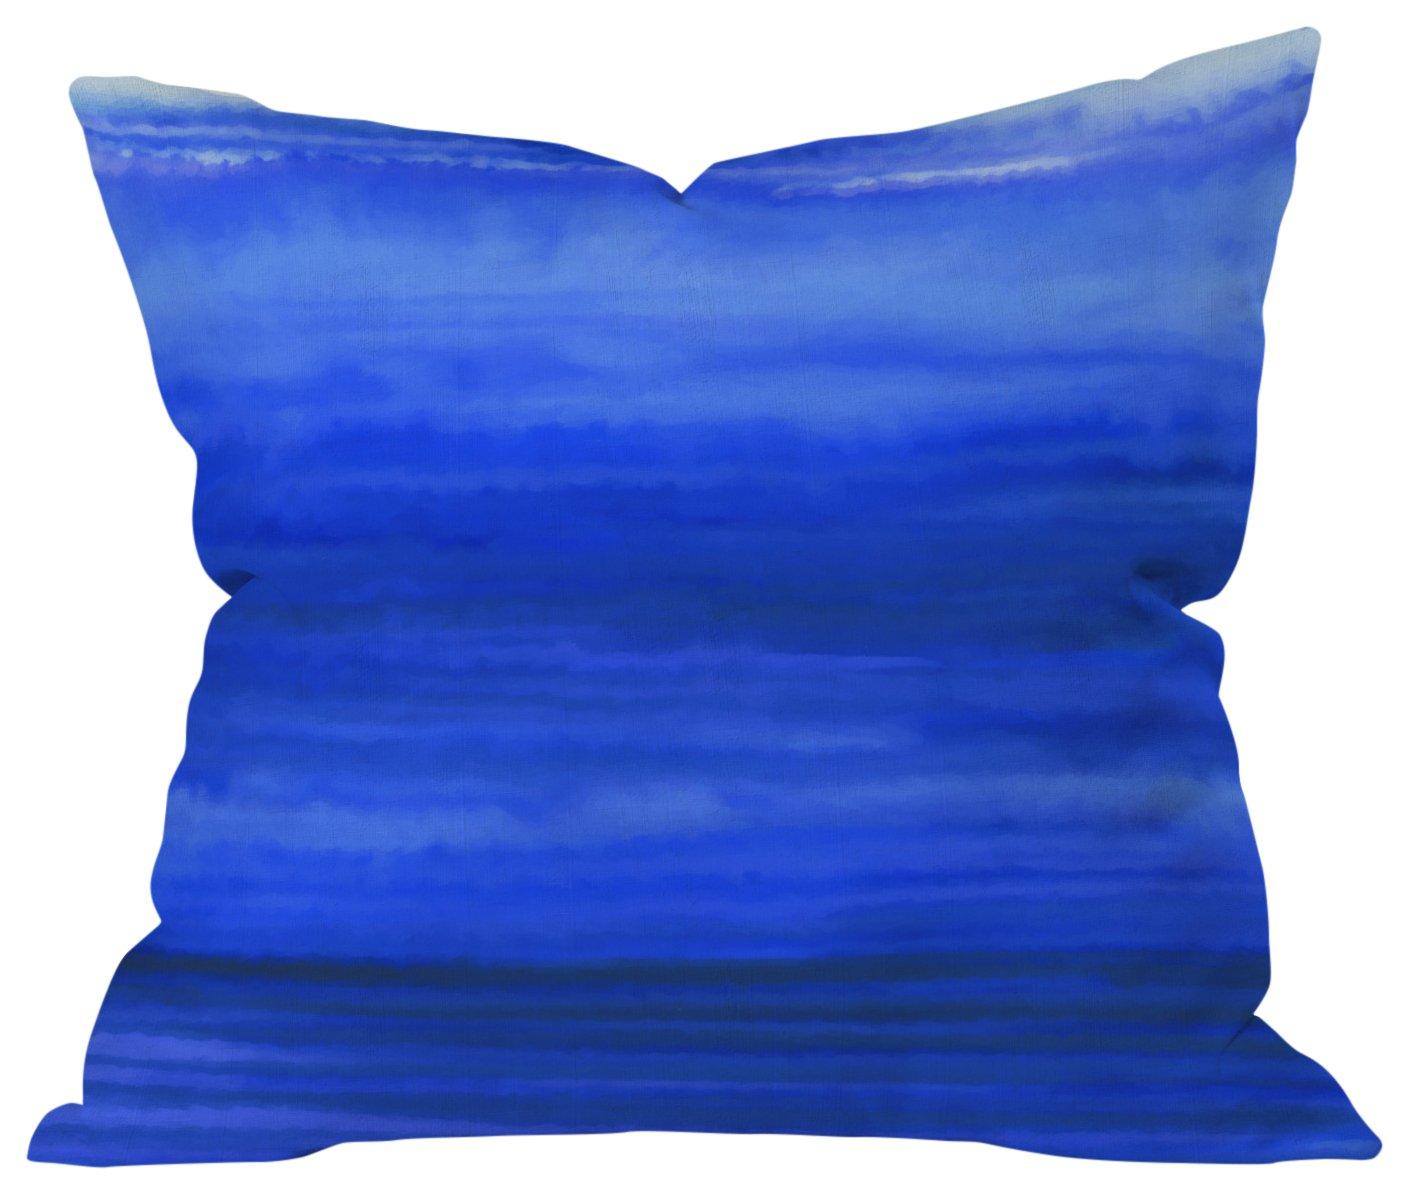 Deny Designs Jacqueline Maldonado Acquiesce 2 Outdoor Throw Pillow 20 x 20